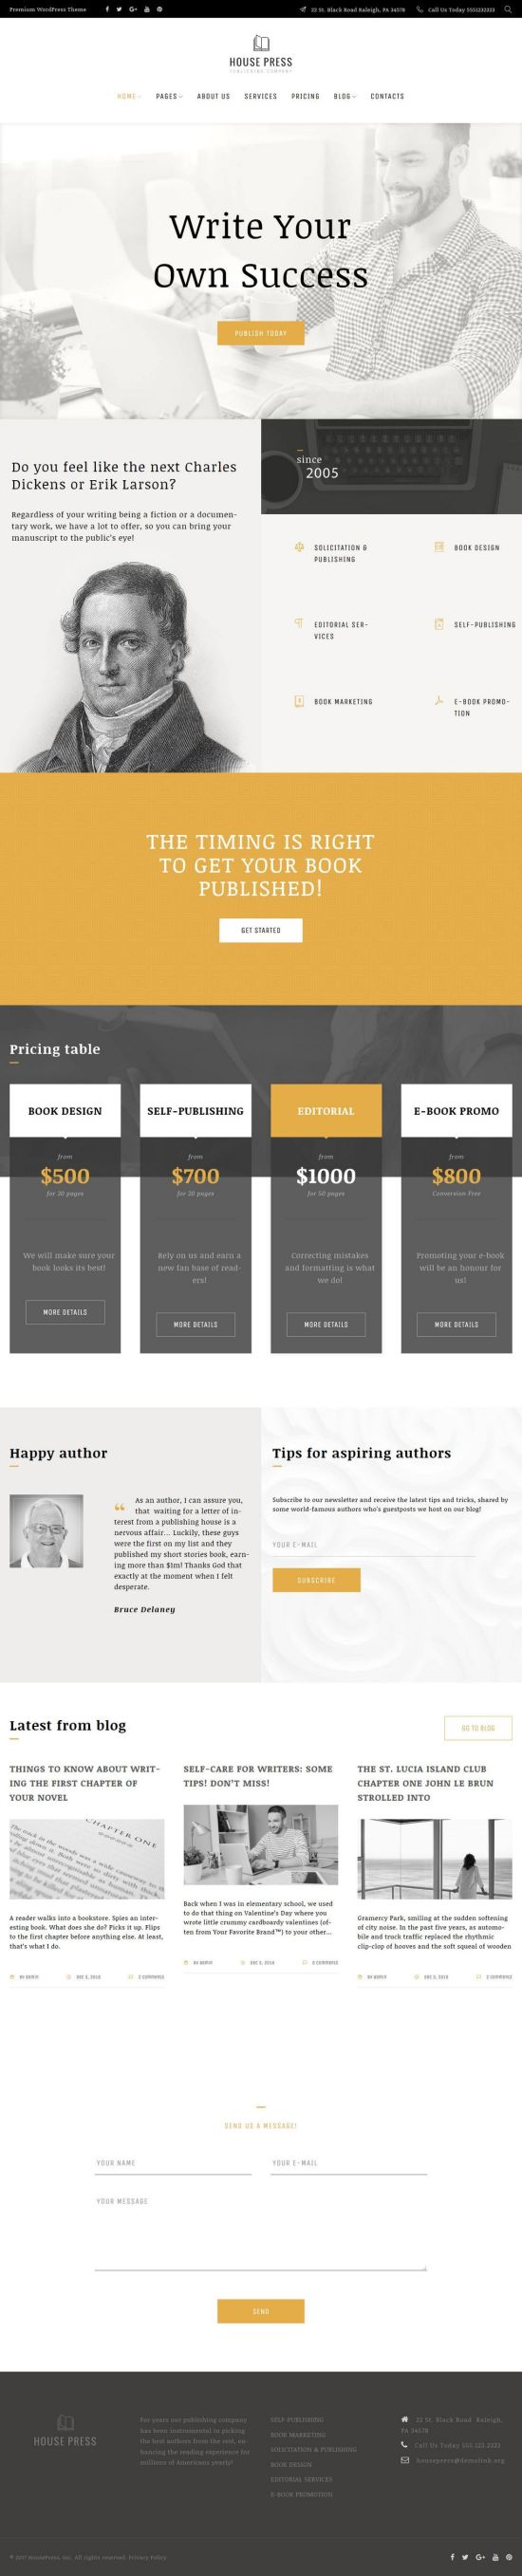 housepress wordpress templatemonster theme 01 - HousePress WordPress Theme